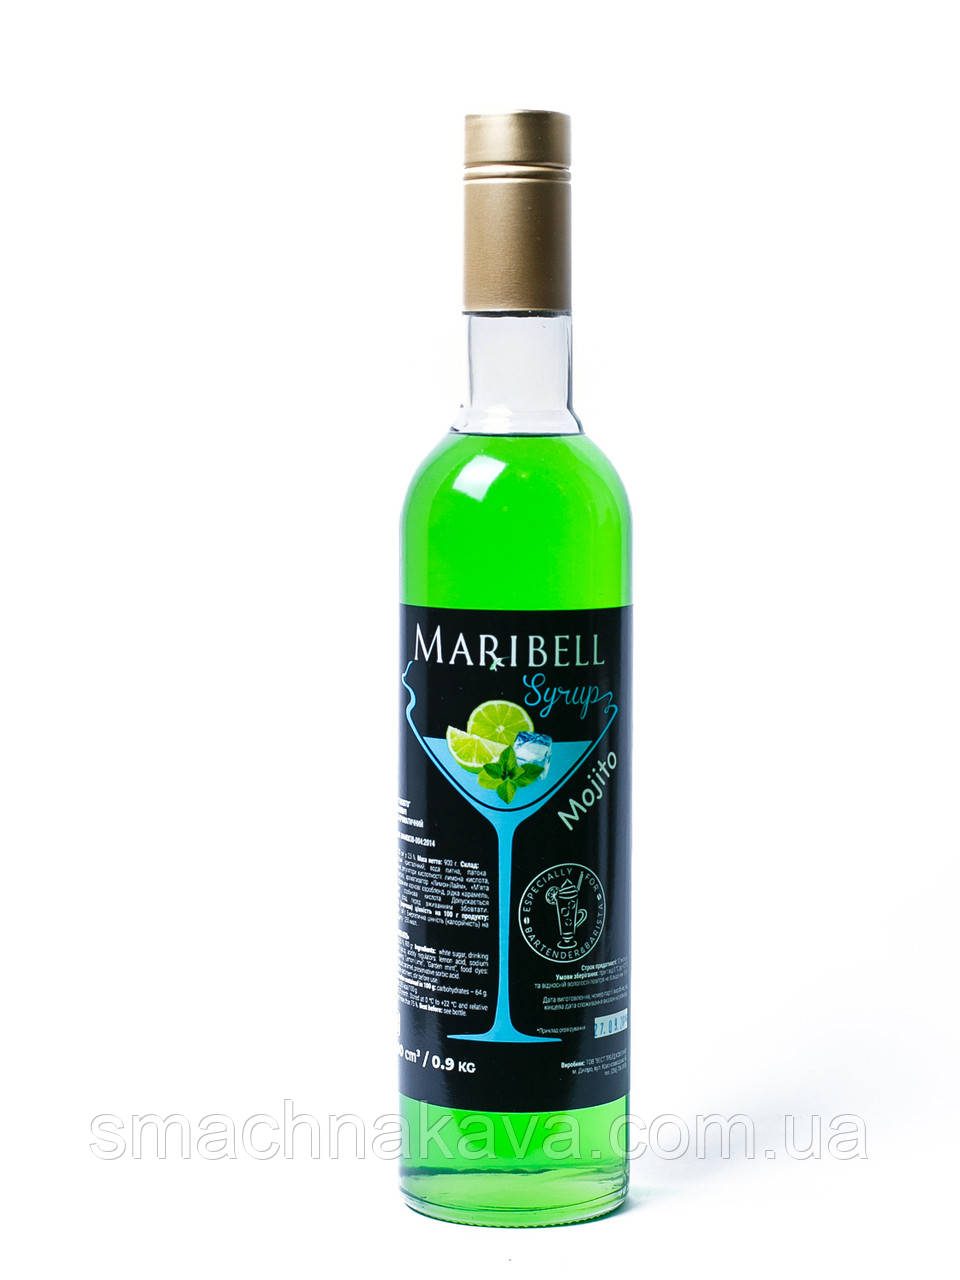 Сироп Мохито зеленый ТМ Maribell